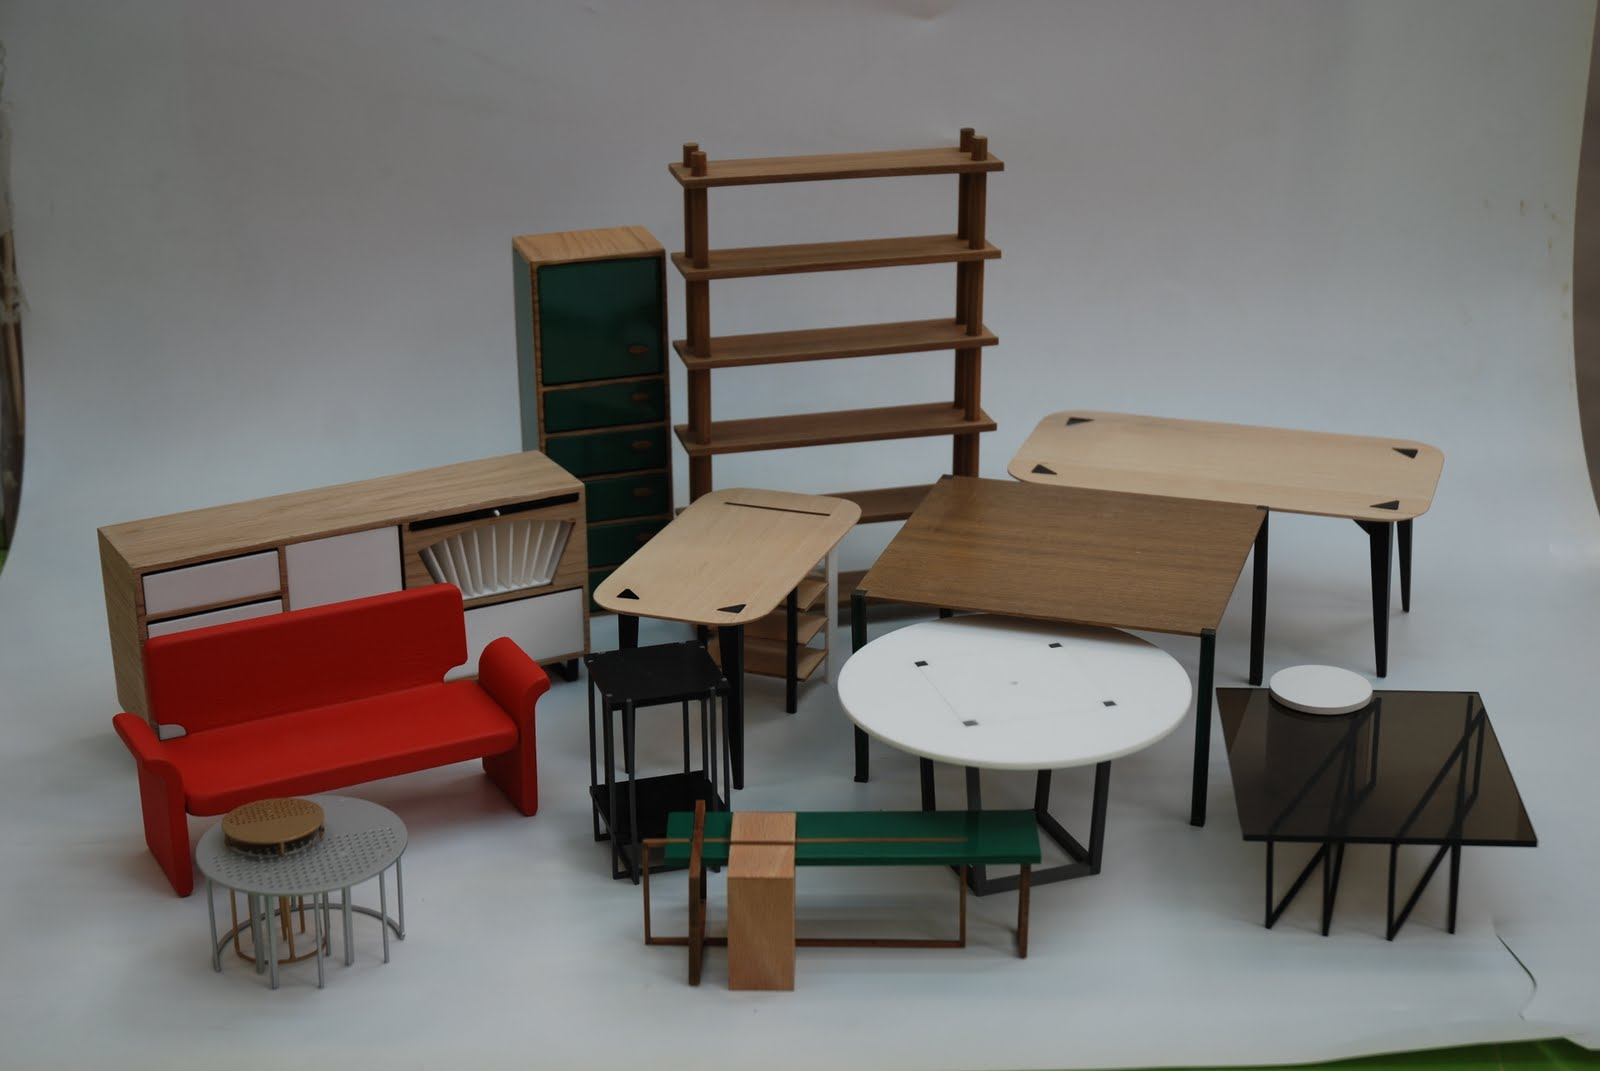 Oceano naranja news maquetas de muebles a escala for Muebles a escala 1 50 para planos